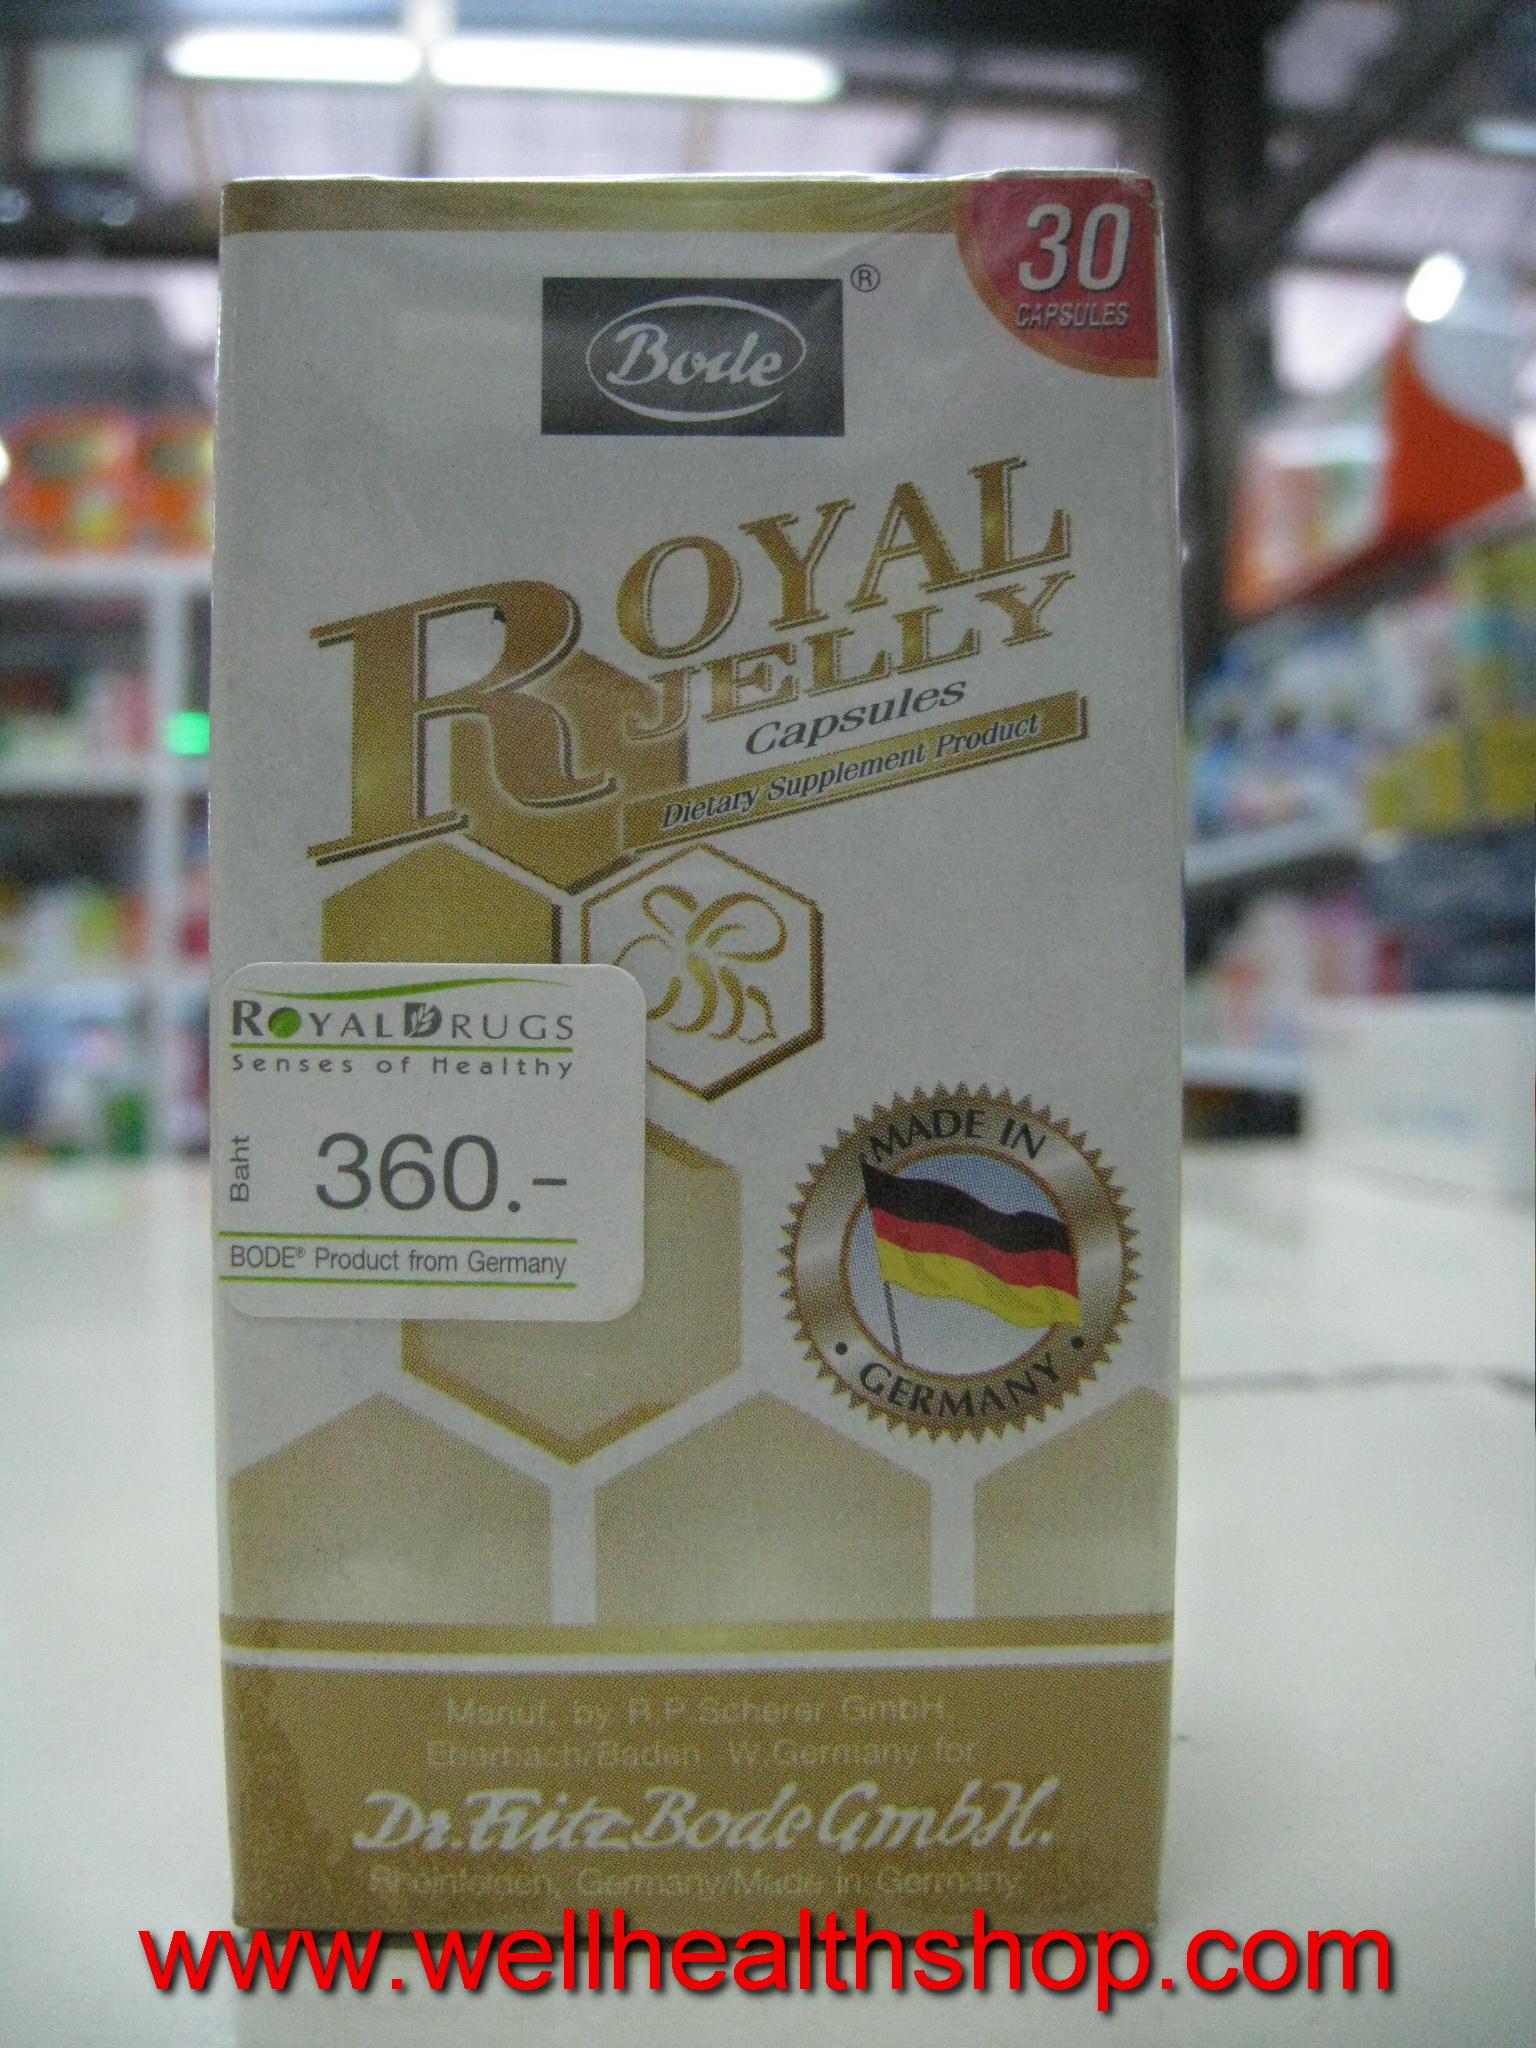 Bode Royal Jelly 30 cap นมผึ้ง โบเด้